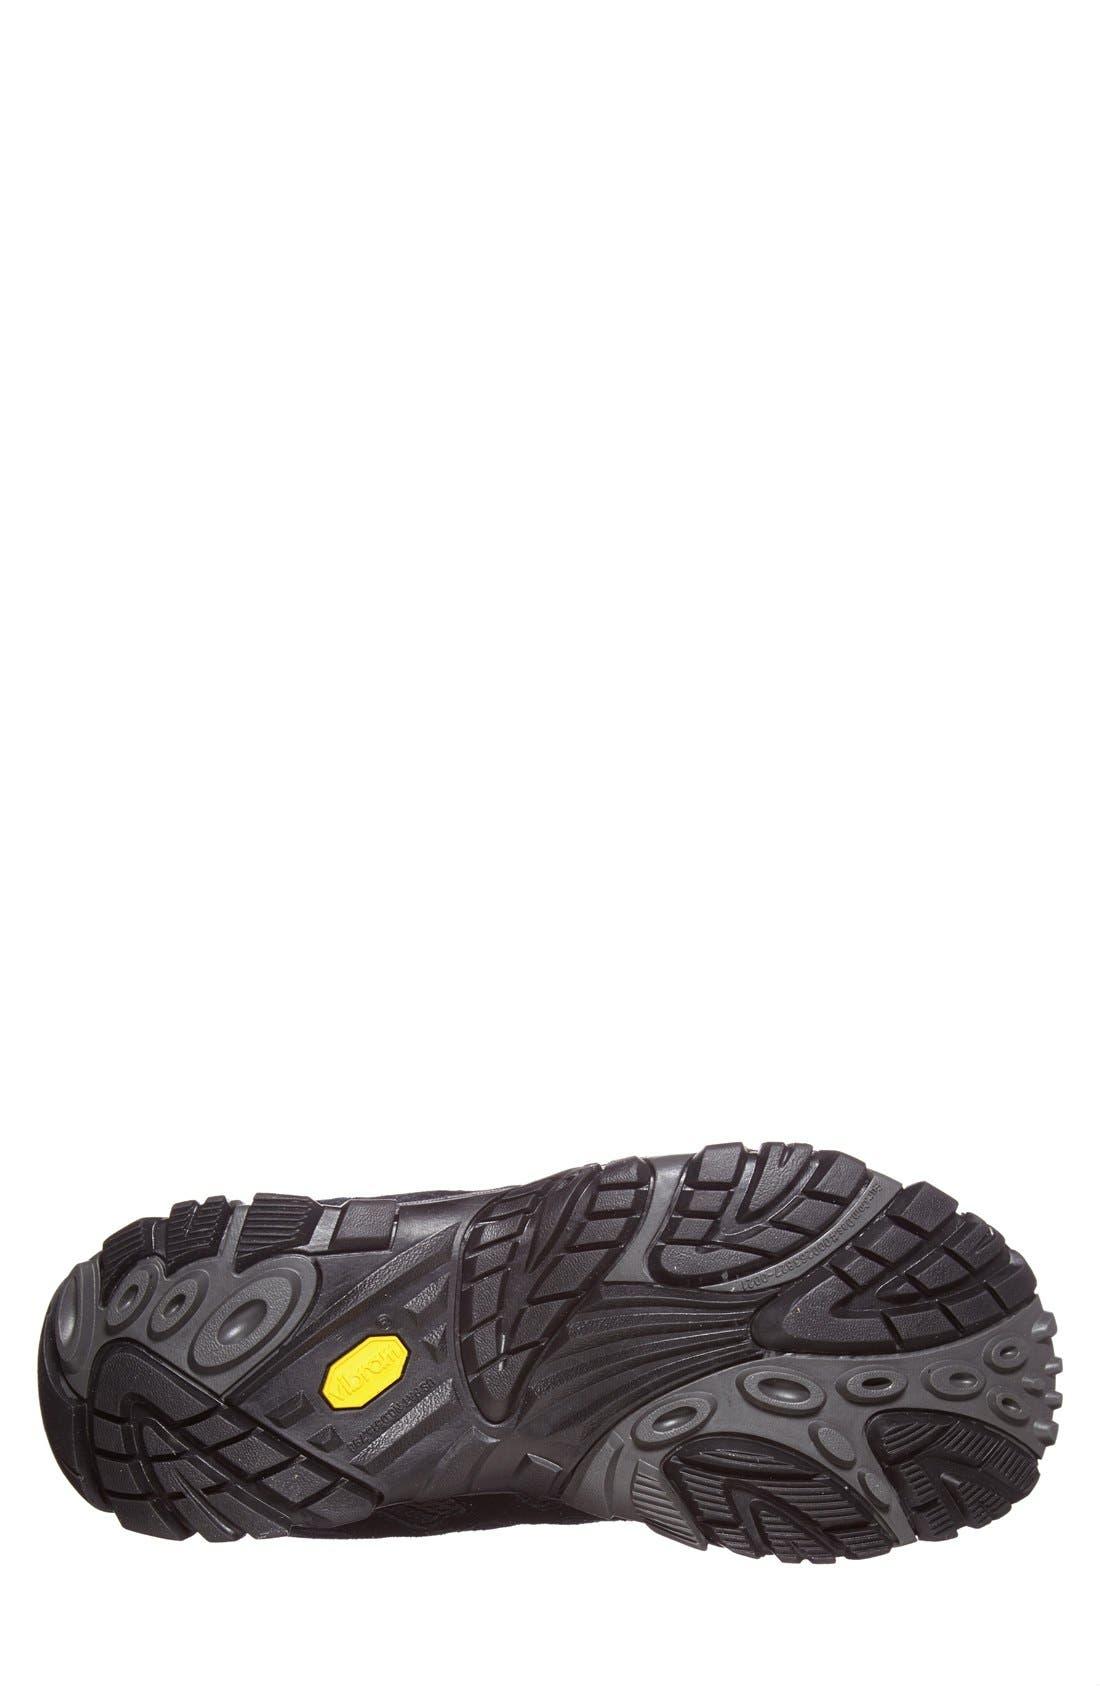 Alternate Image 3  - Merrell 'Moab Ventilator' Hiking Shoe (Men)